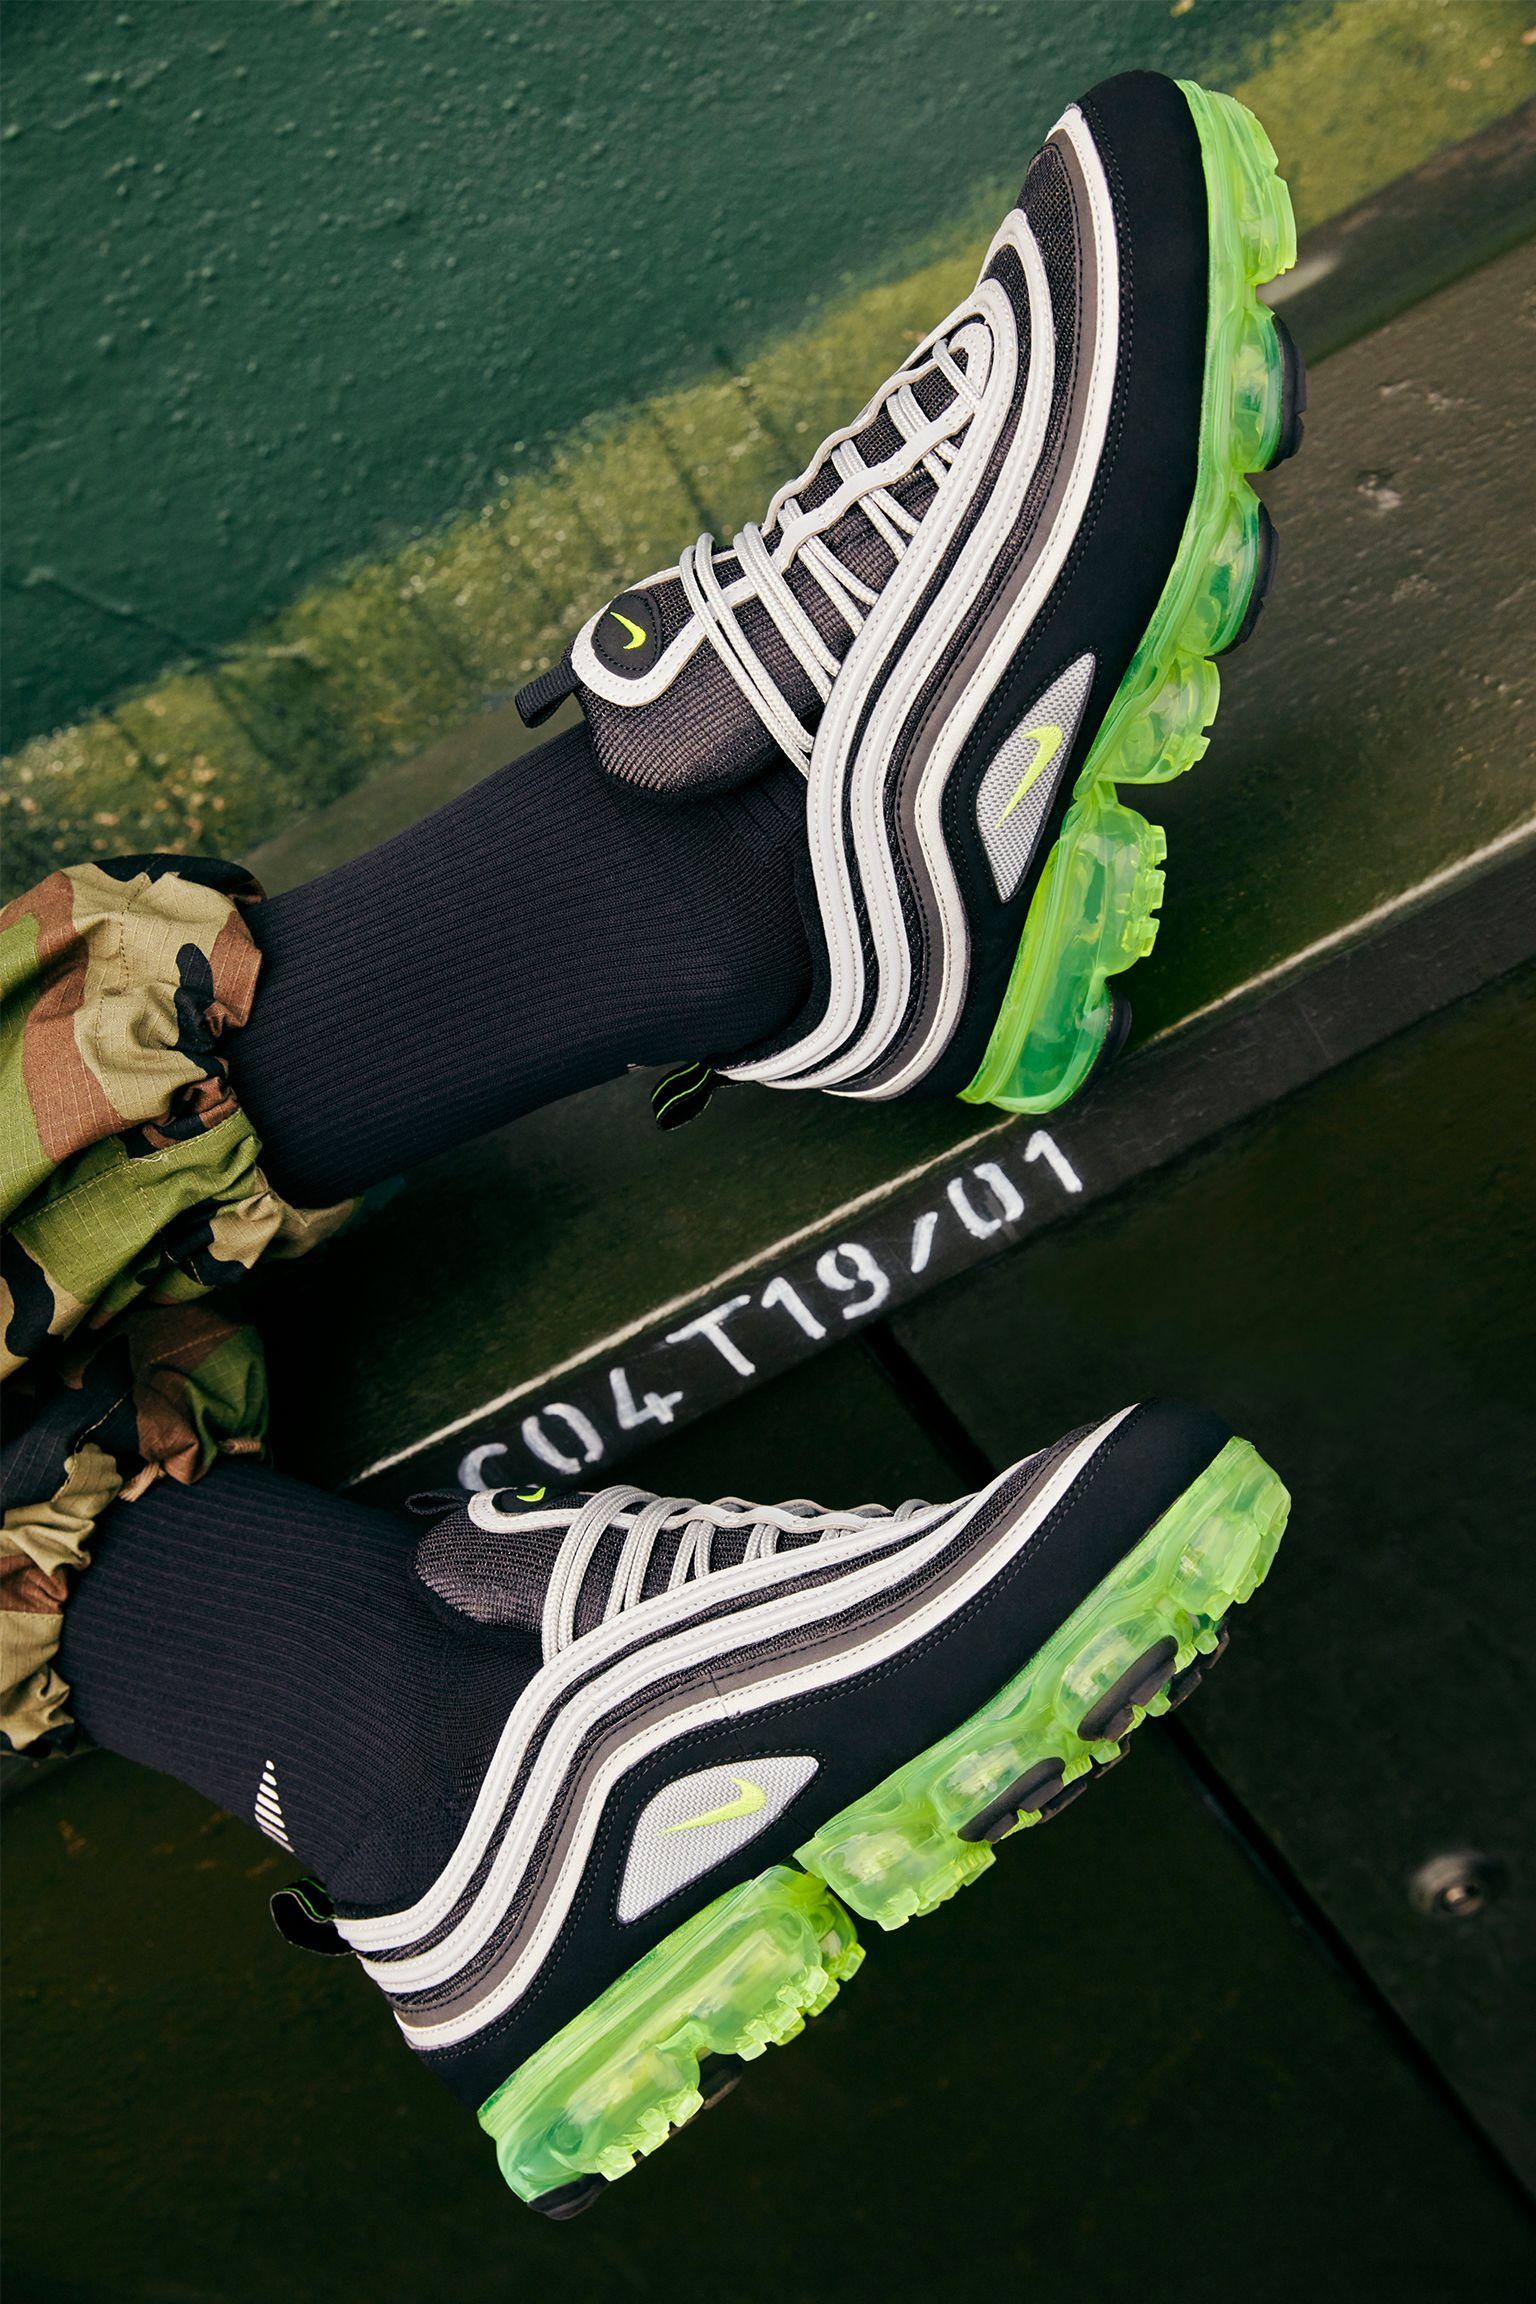 Nike Air Vapormax 97 'Black & Volt & Metallic Silver' Release Date